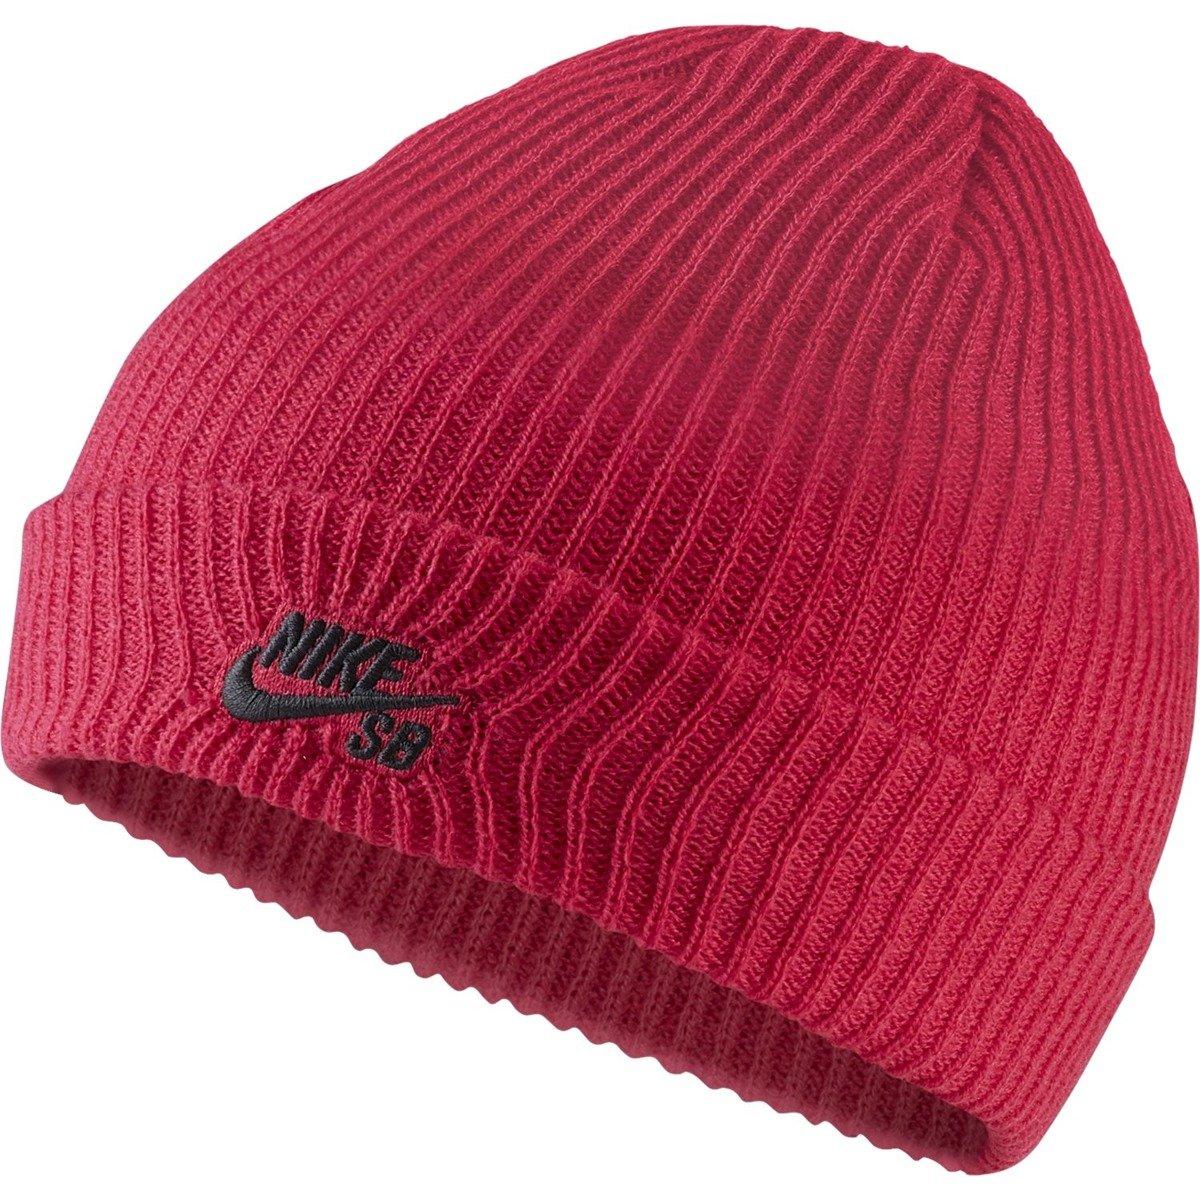 nike sb fisherman beanie Rush Pink black red  0d5b6a8c437c